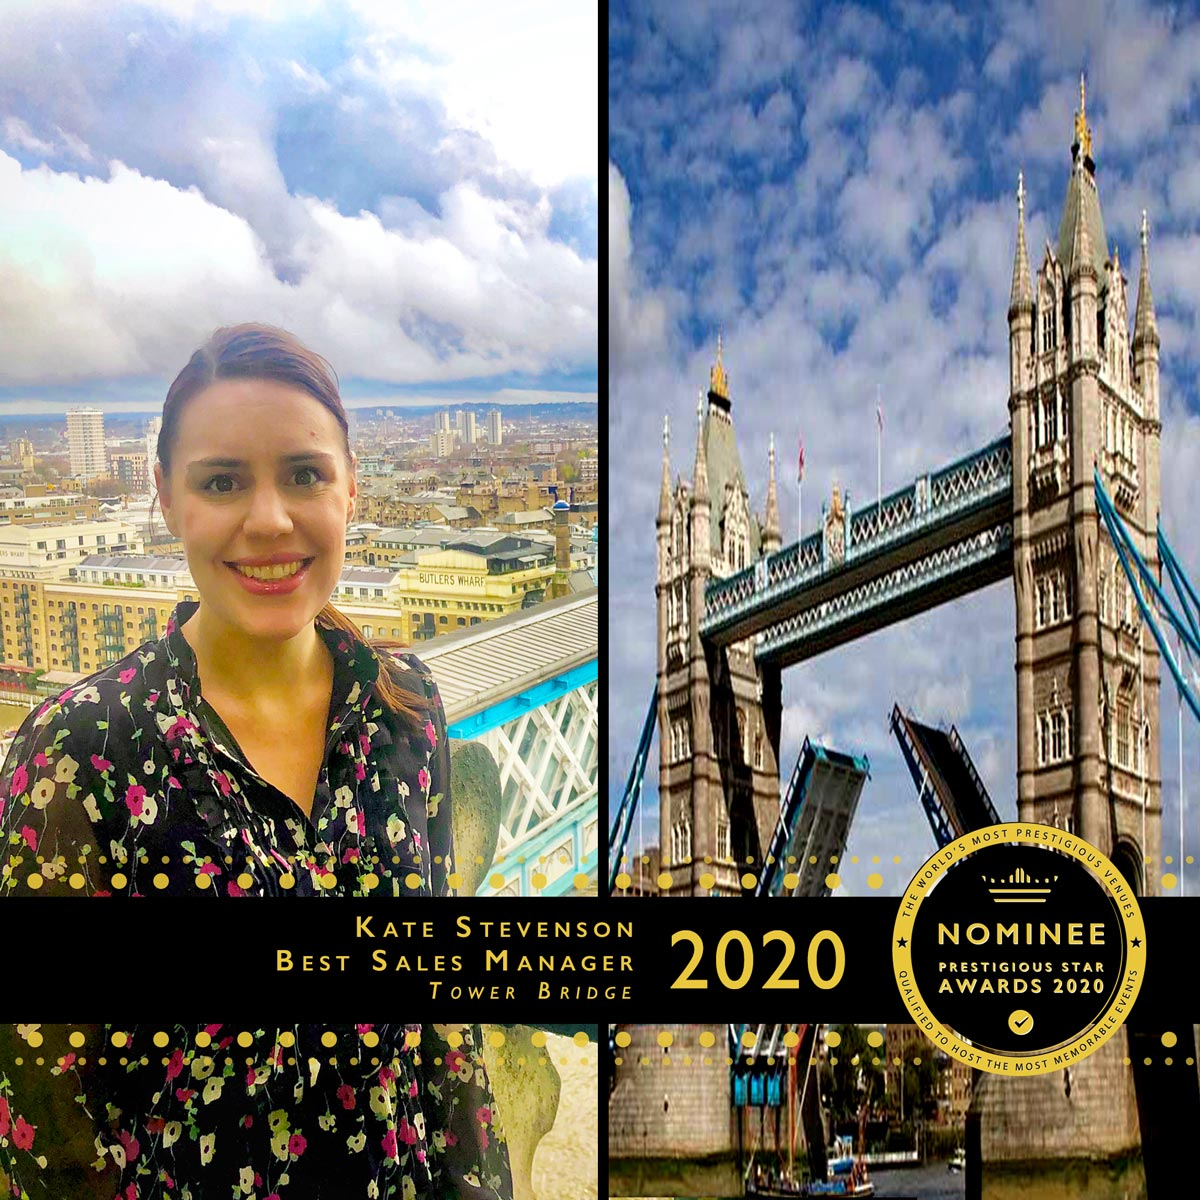 Kate Stevenson at Tower Bridge